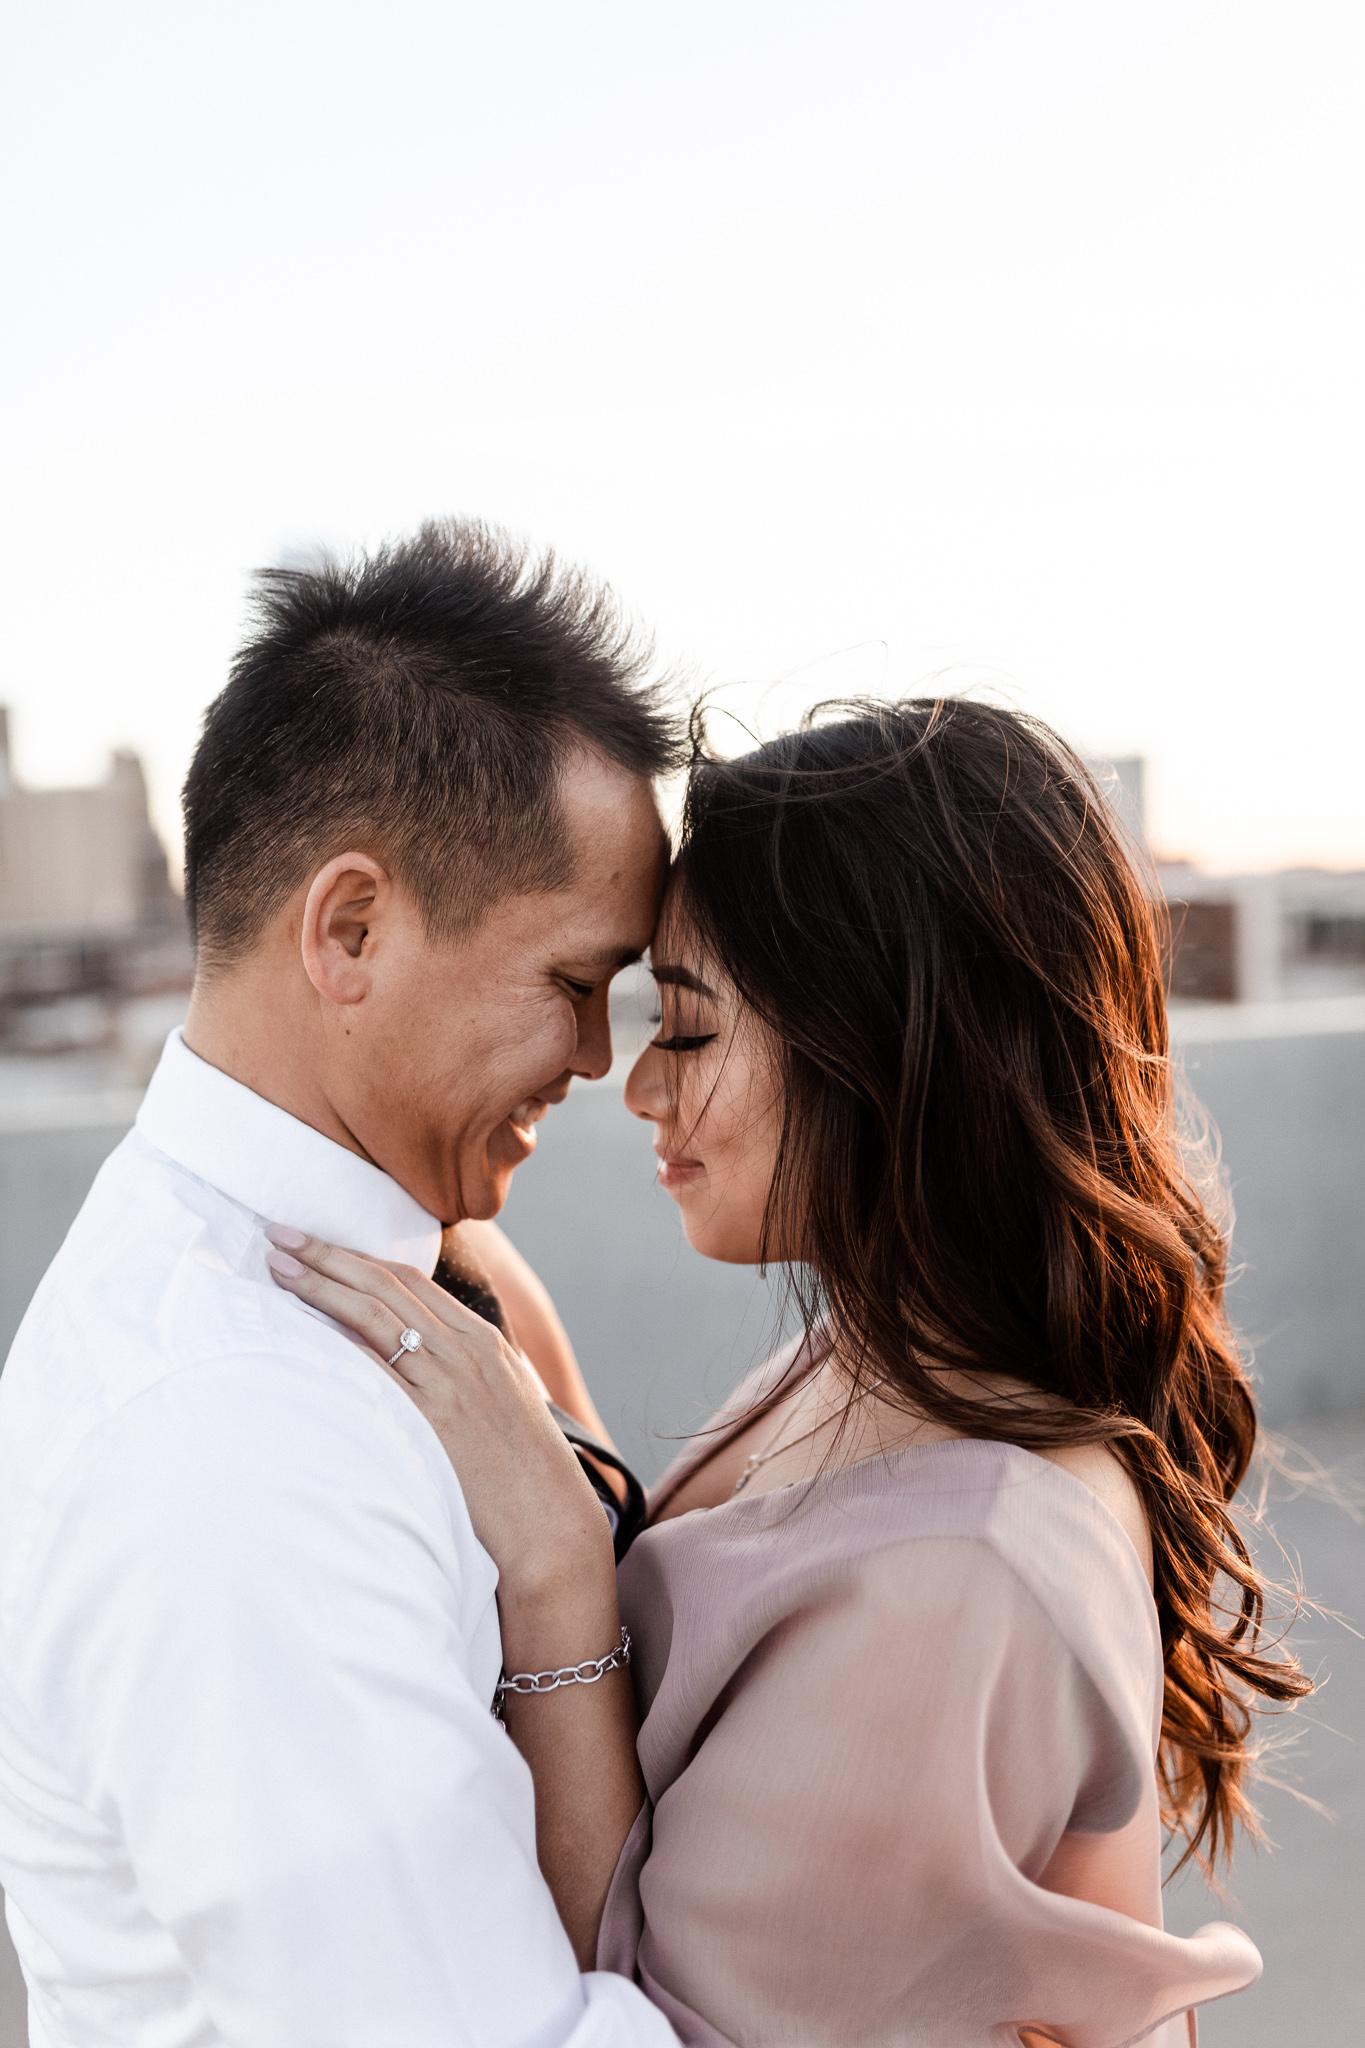 Hieu + Teresa | Colorful Romantic Downtown Engagements | Oklahoma Wedding Photographer-61.jpg